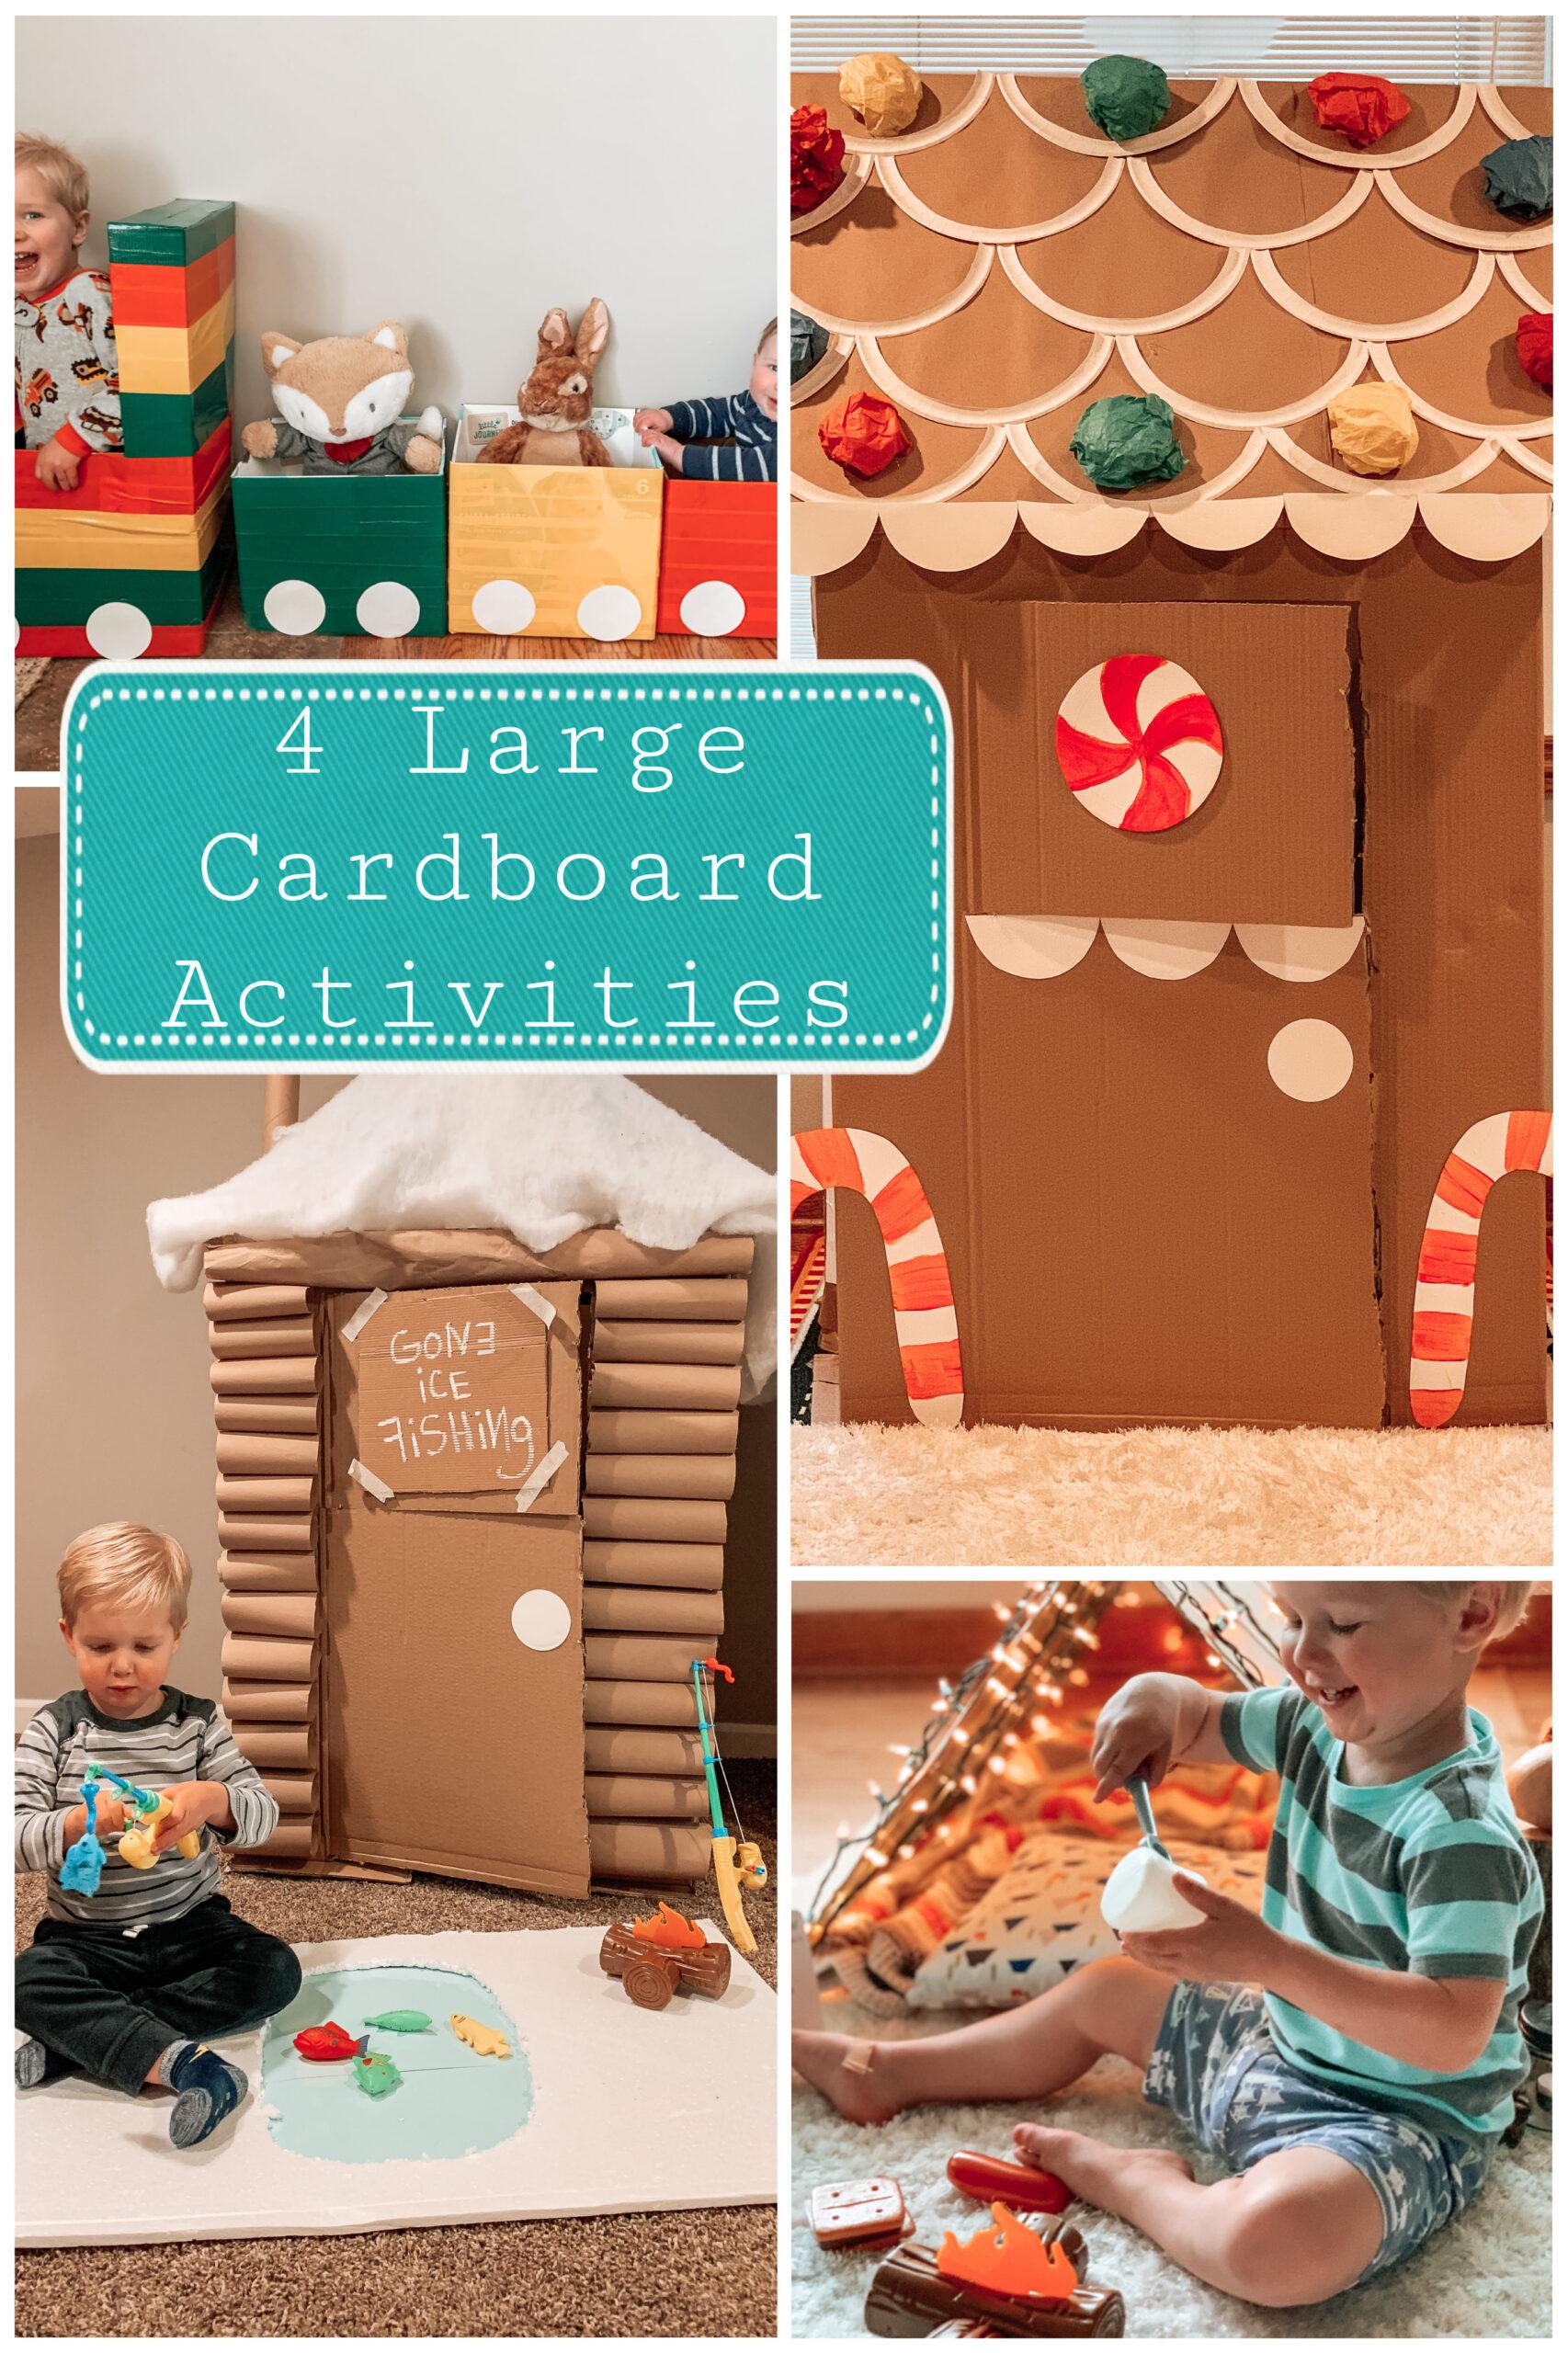 4 Large Cardboard Box Activities